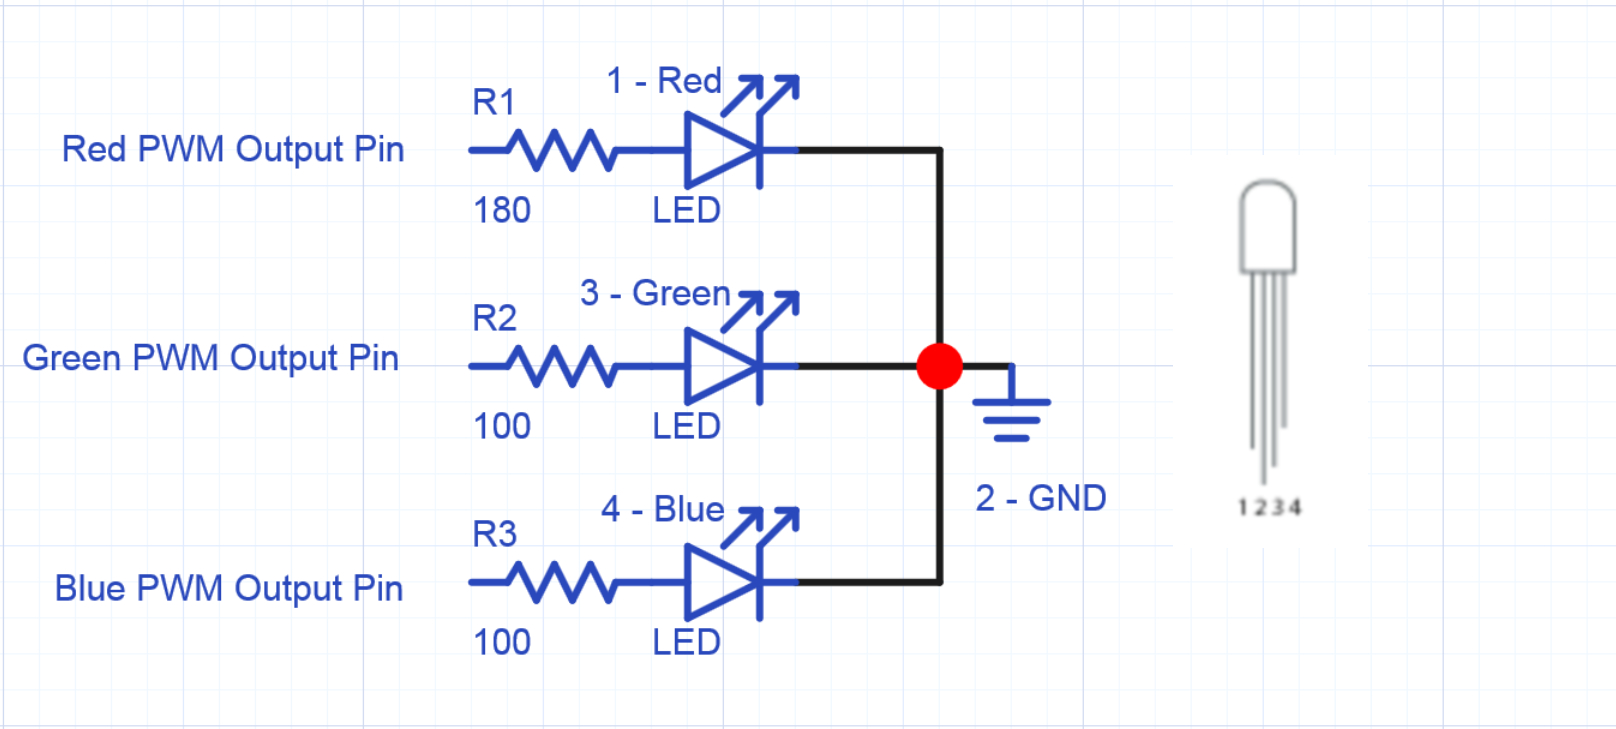 Rgb Led Wiring - Wiring Diagram Blog - Rgb Led Wiring Diagram